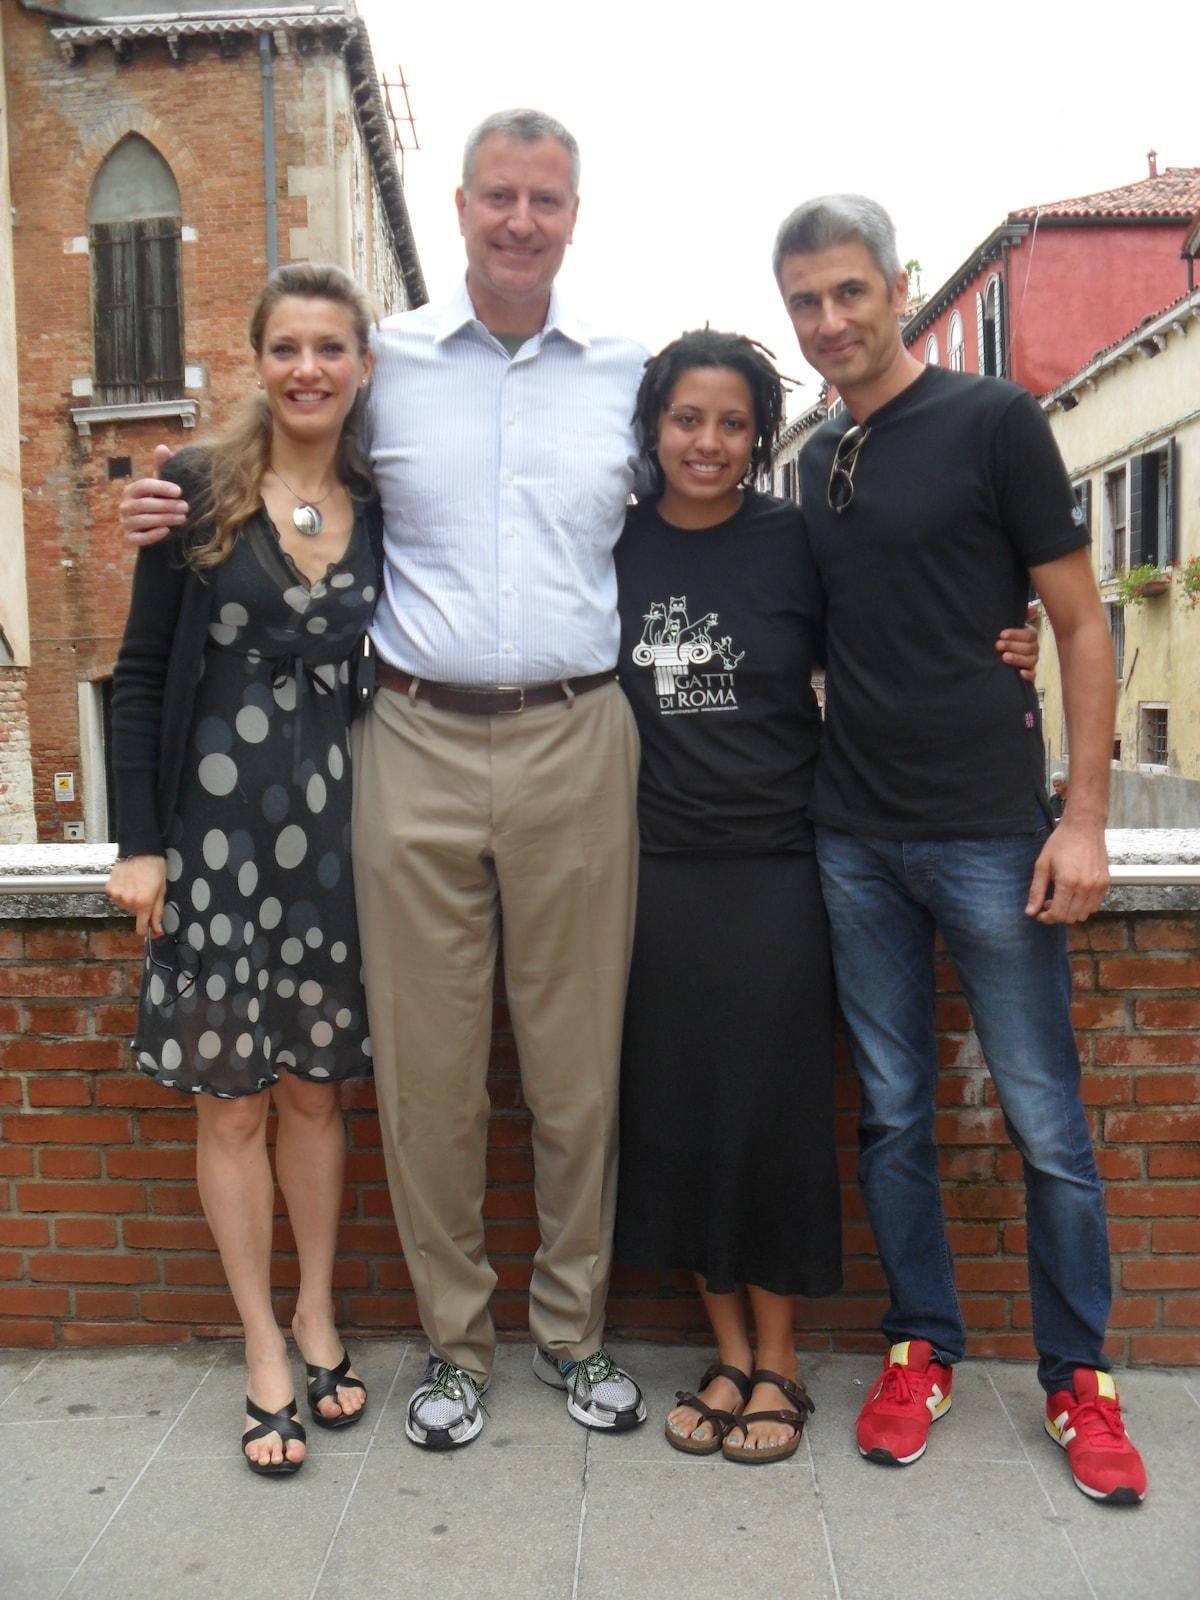 Nicola, Maria Chiara and the mayor of New york Bill de Blasio on the bridge near Santa Margherita - Venezia